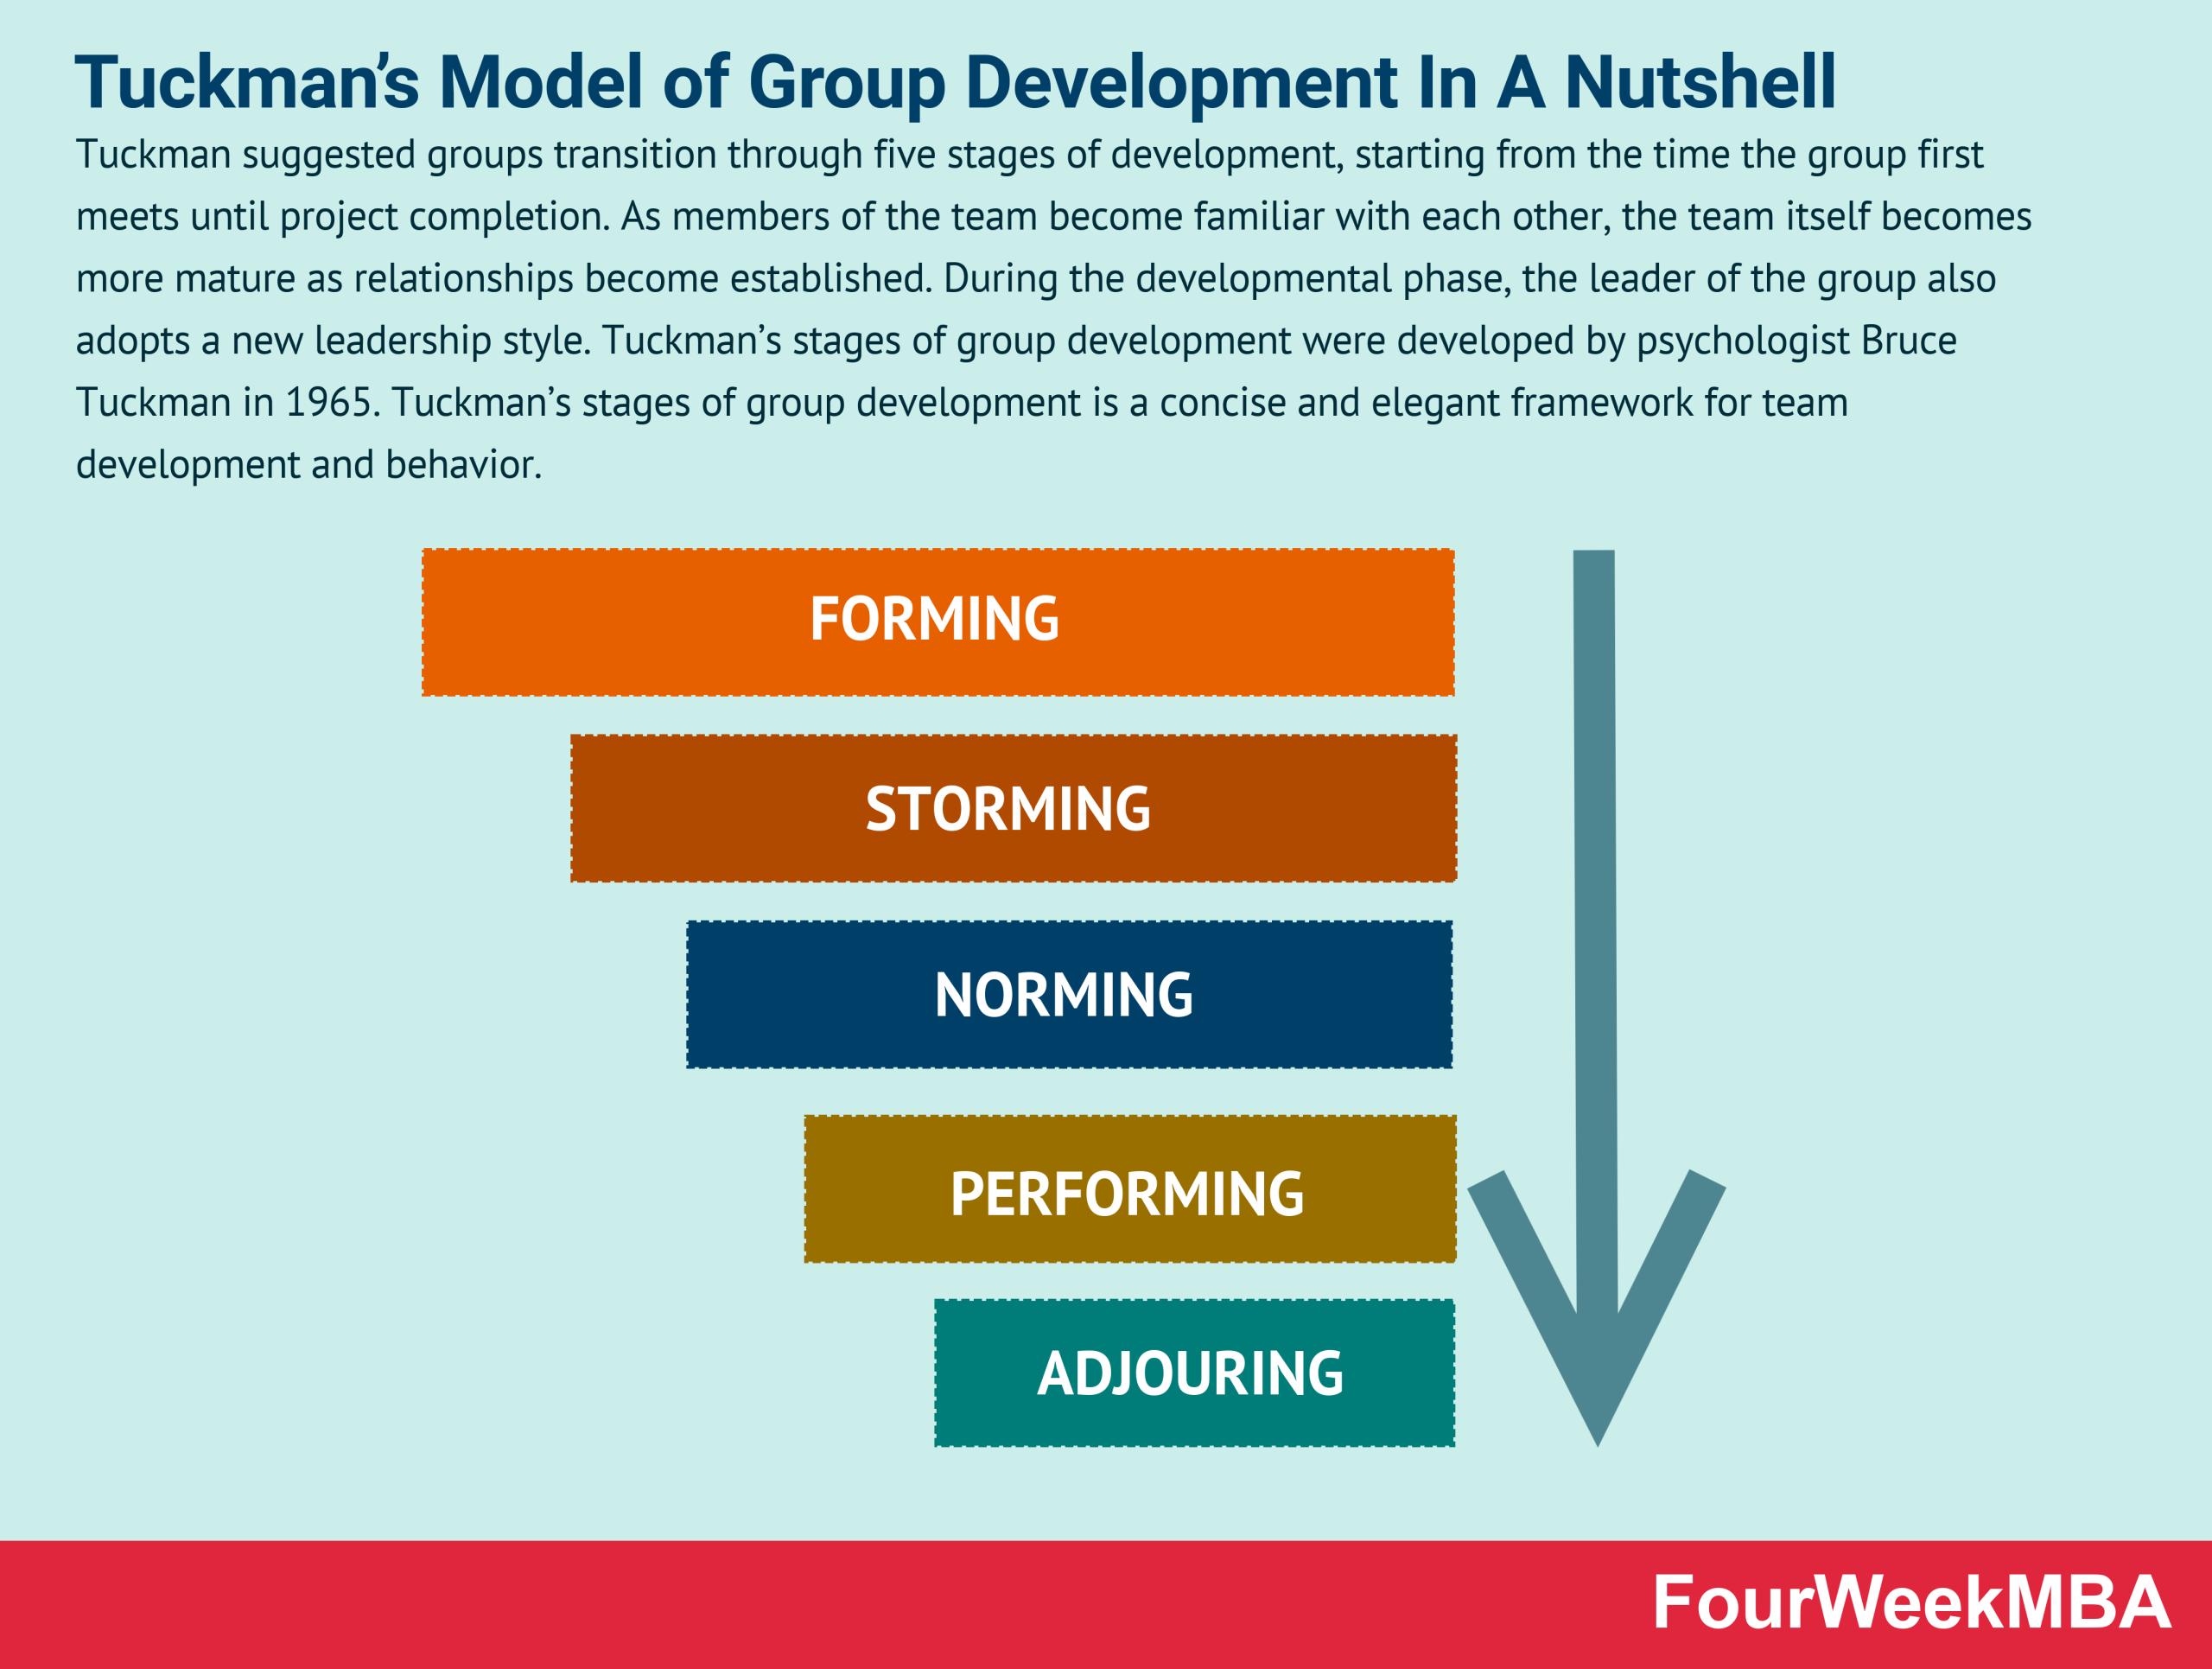 tuckmans-model